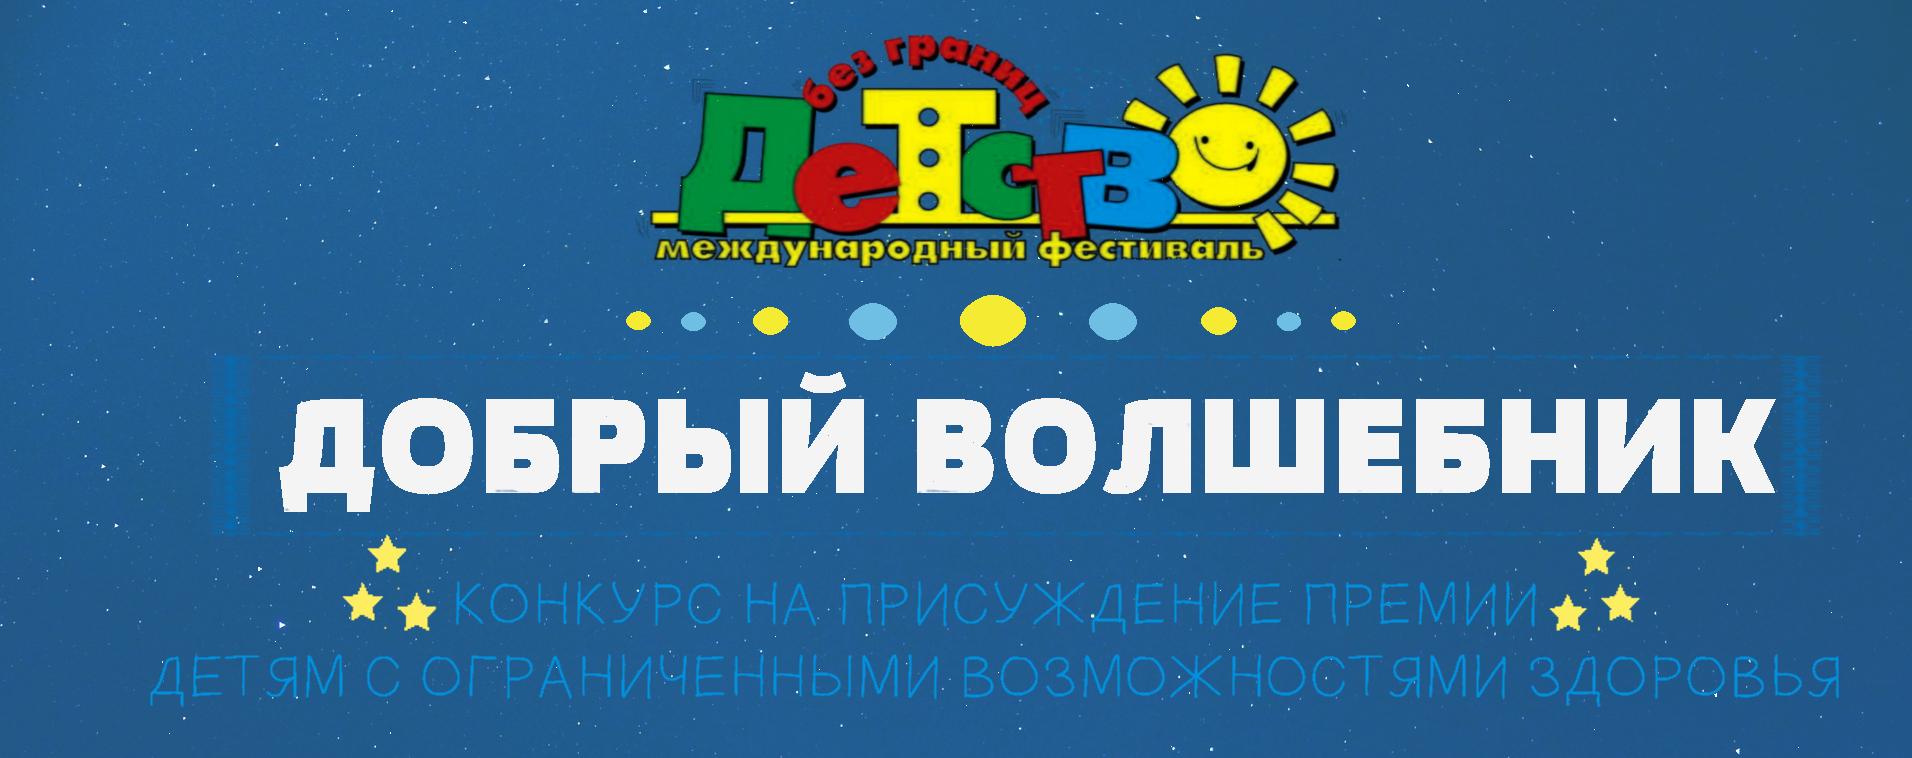 http://rooidom.ru/wp-content/uploads/2017/05/добрый-волшебник.jpg